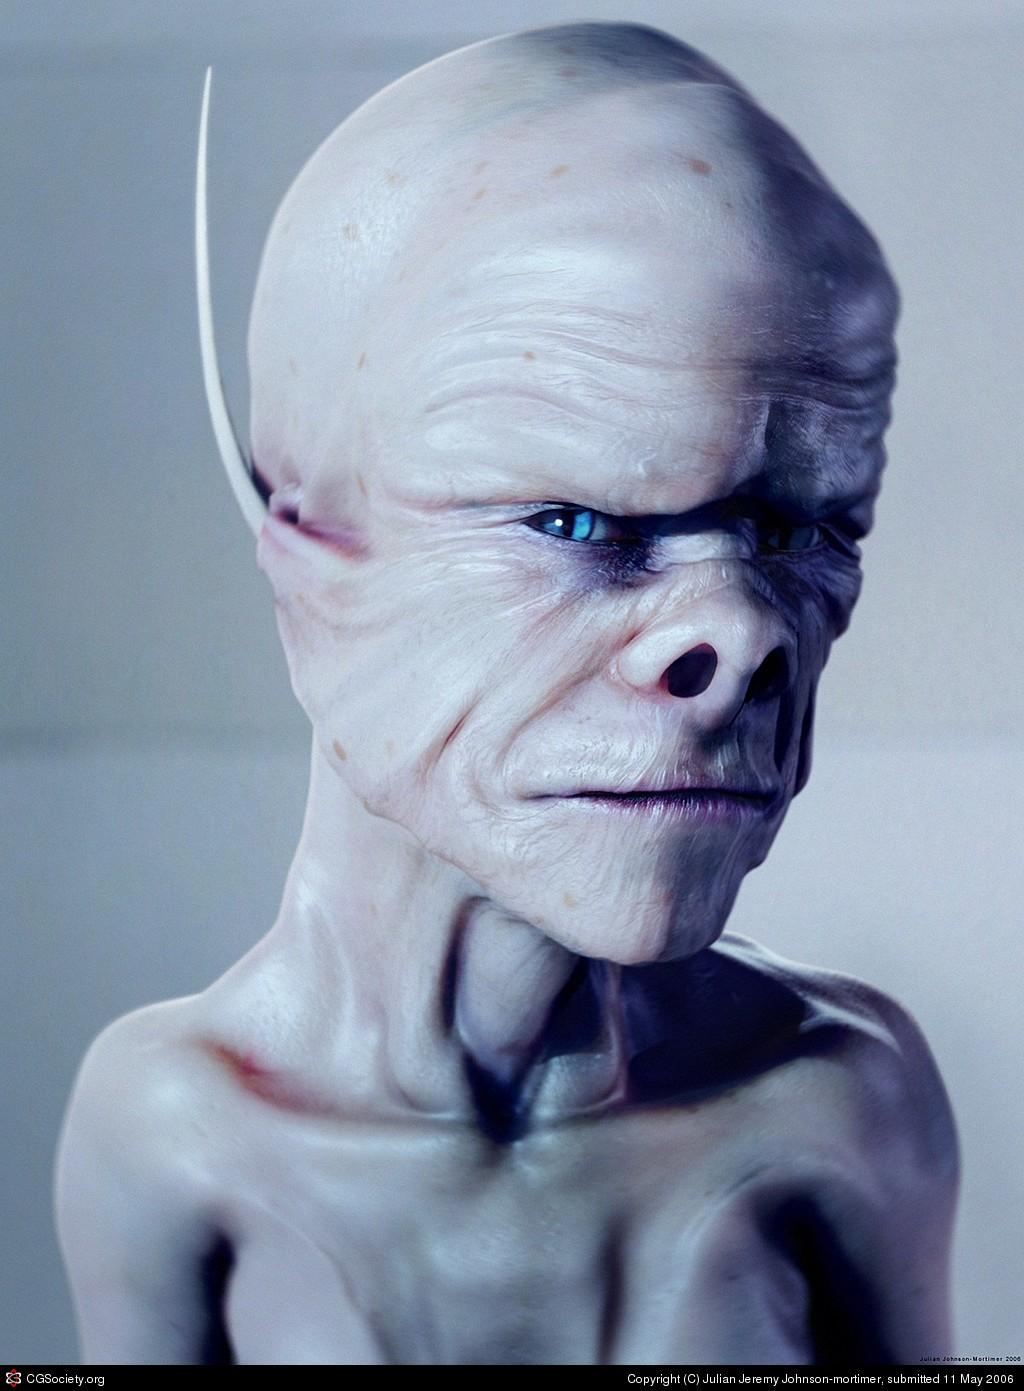 Julianjohnson alien creature conce 1 73019004 cq3h